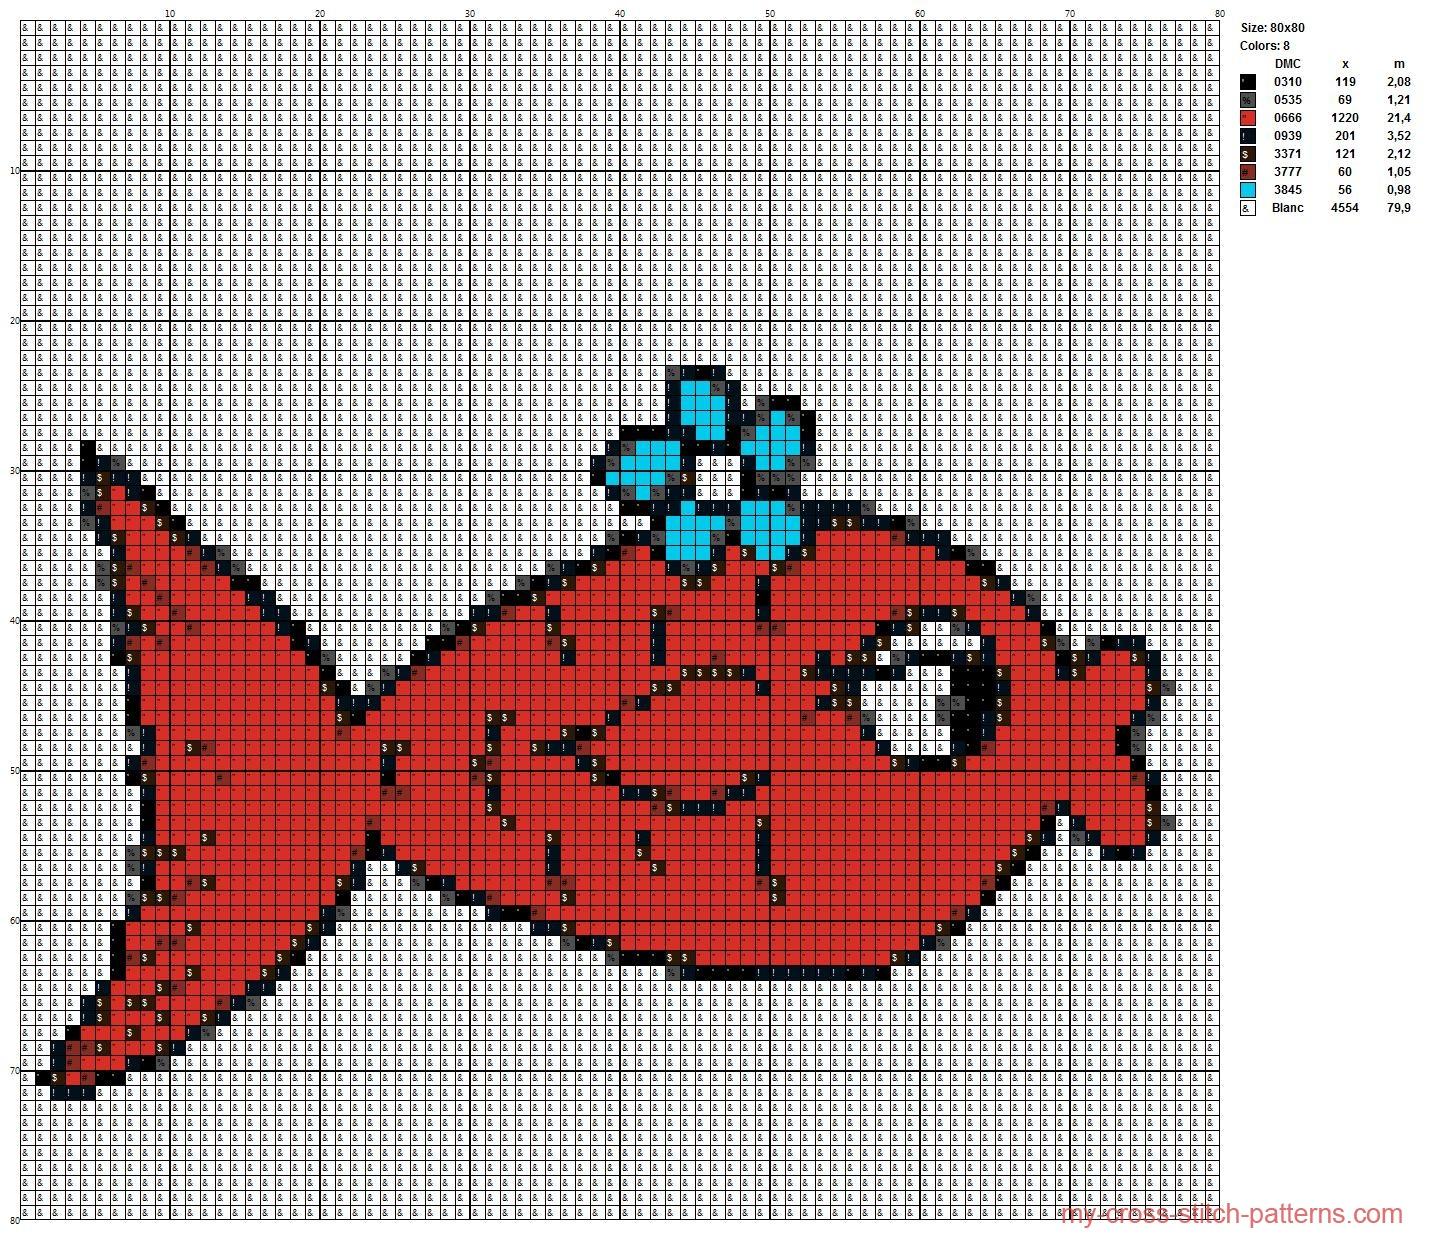 goldfish_cross_stitch_pattern_free_80x80_x_8_dmc_threads_scheme_maker